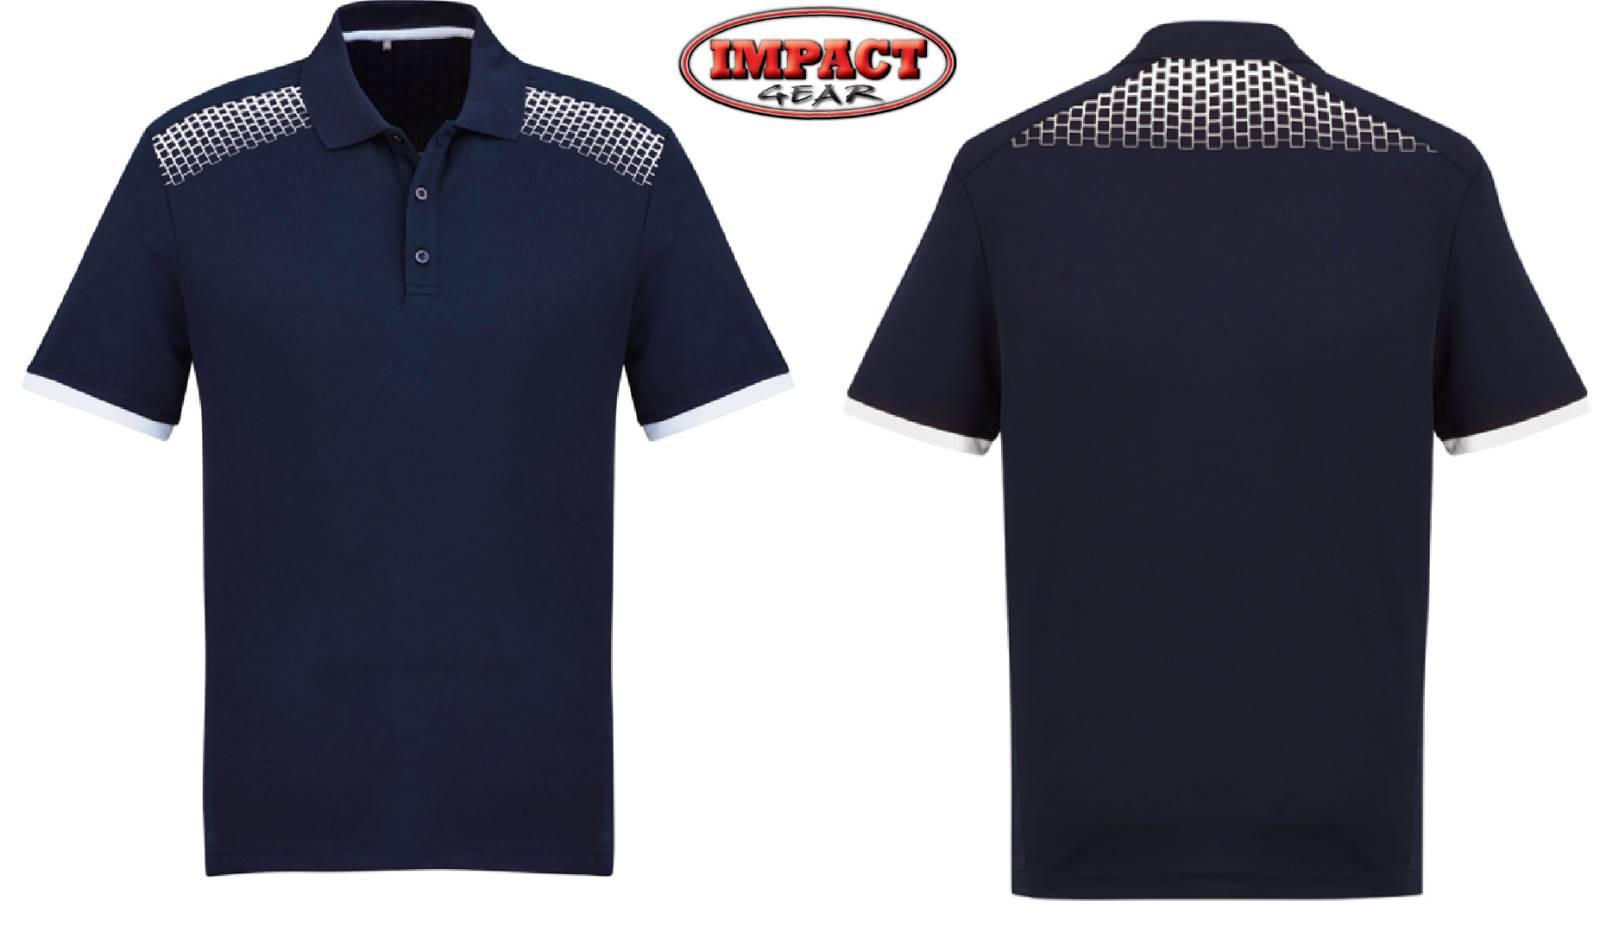 Navy / White Galaxy Polo shirt